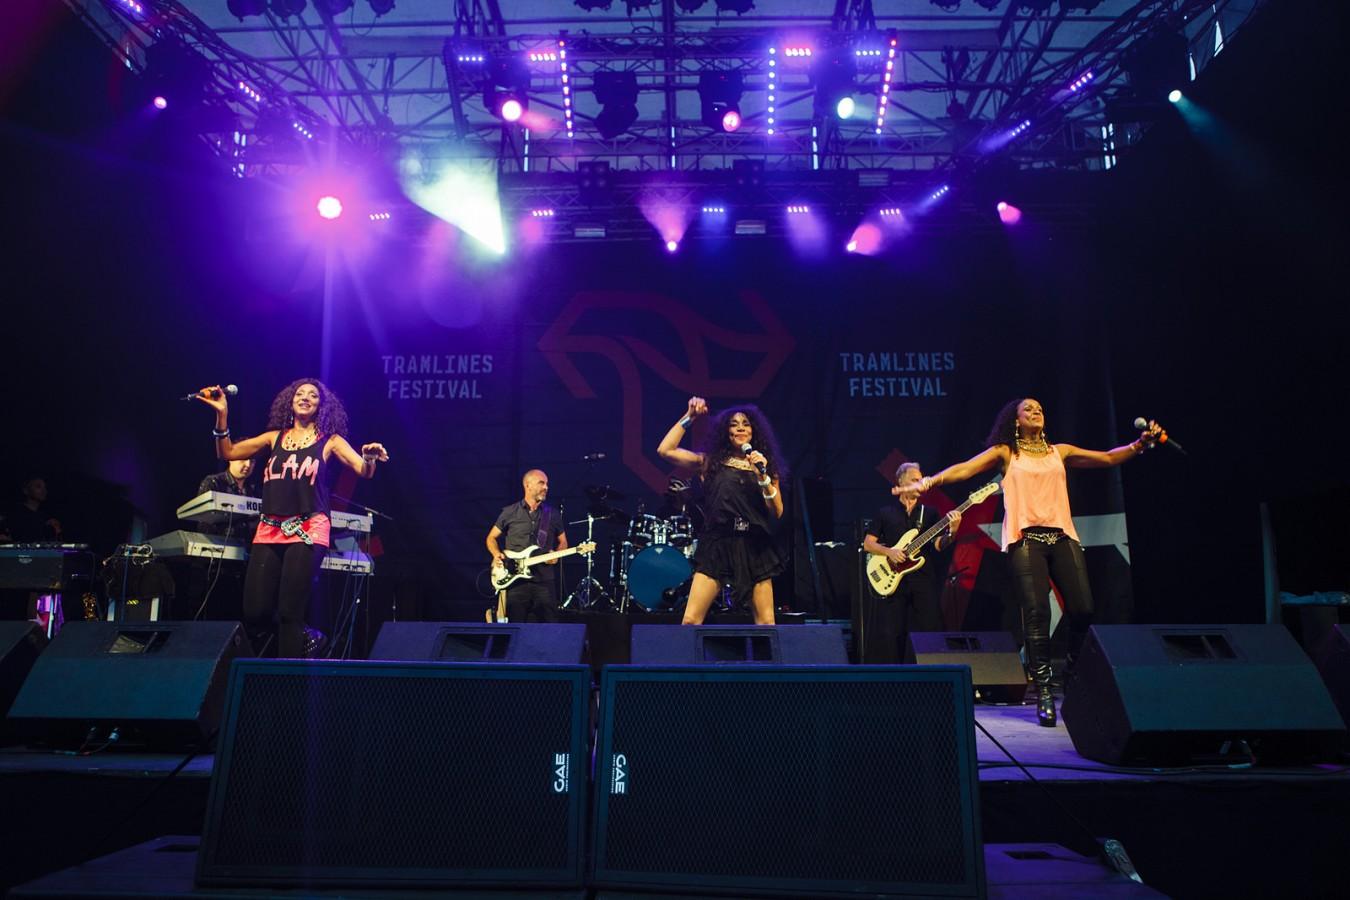 Sister-Sledge-Main-Stage-Tramlines-2014-Photo-Andy-Benge-1350x900.jpg